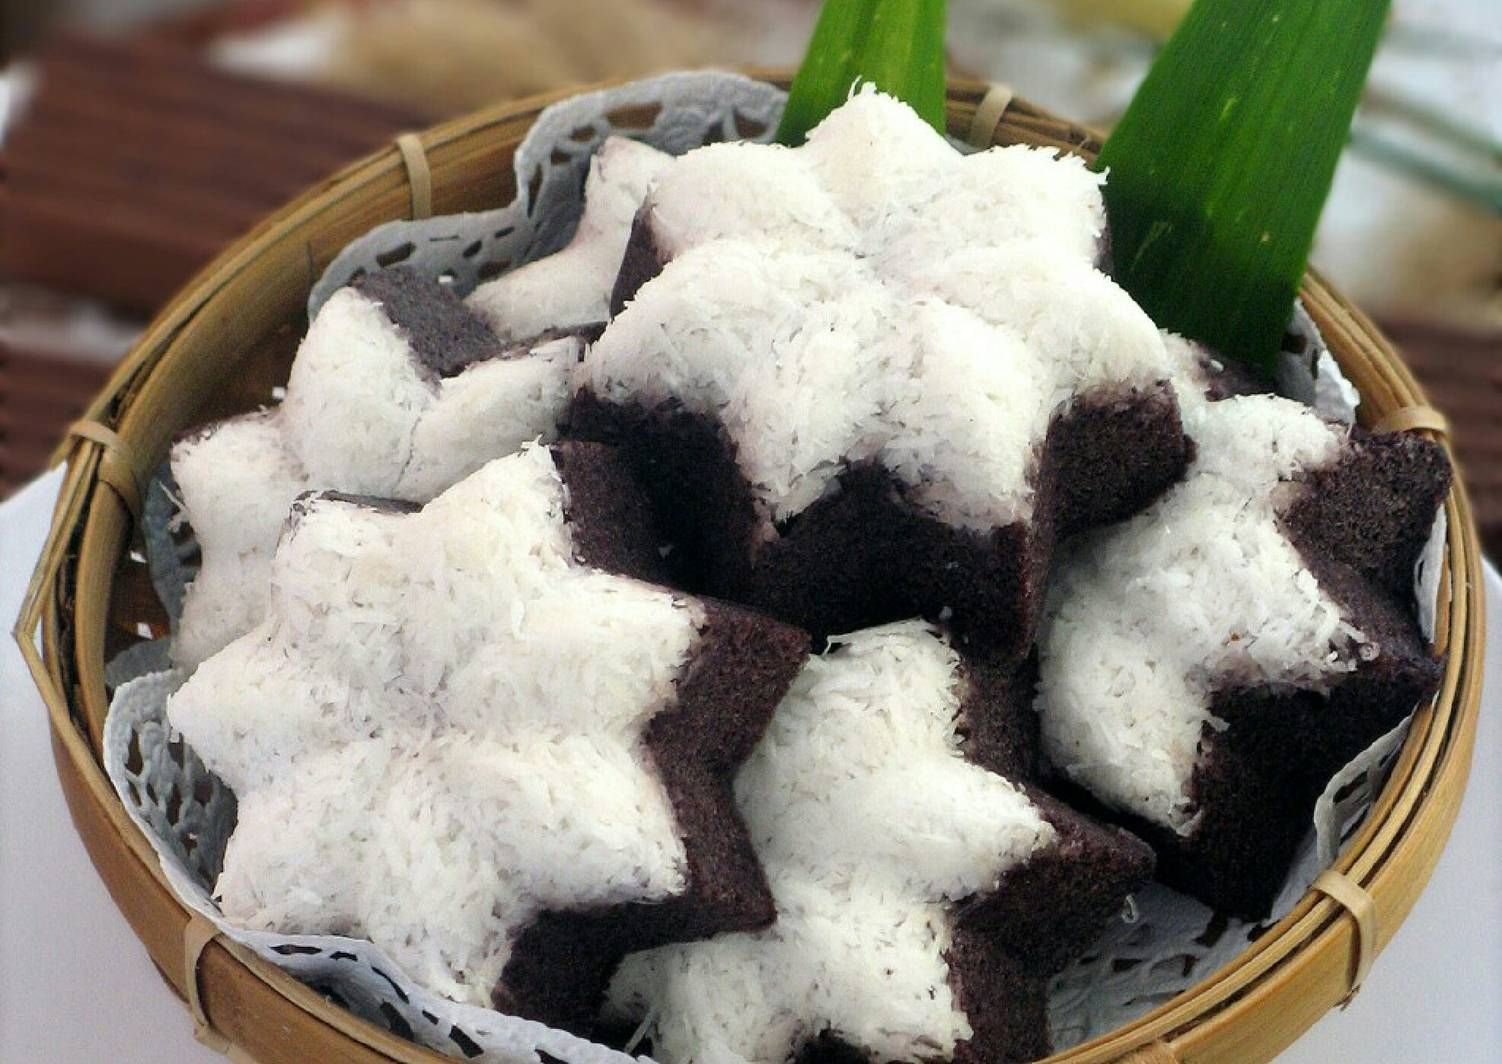 Resep Putu Ayu Ketan Hitam Oleh Missantiii Resep Resep Makanan Adonan Kue